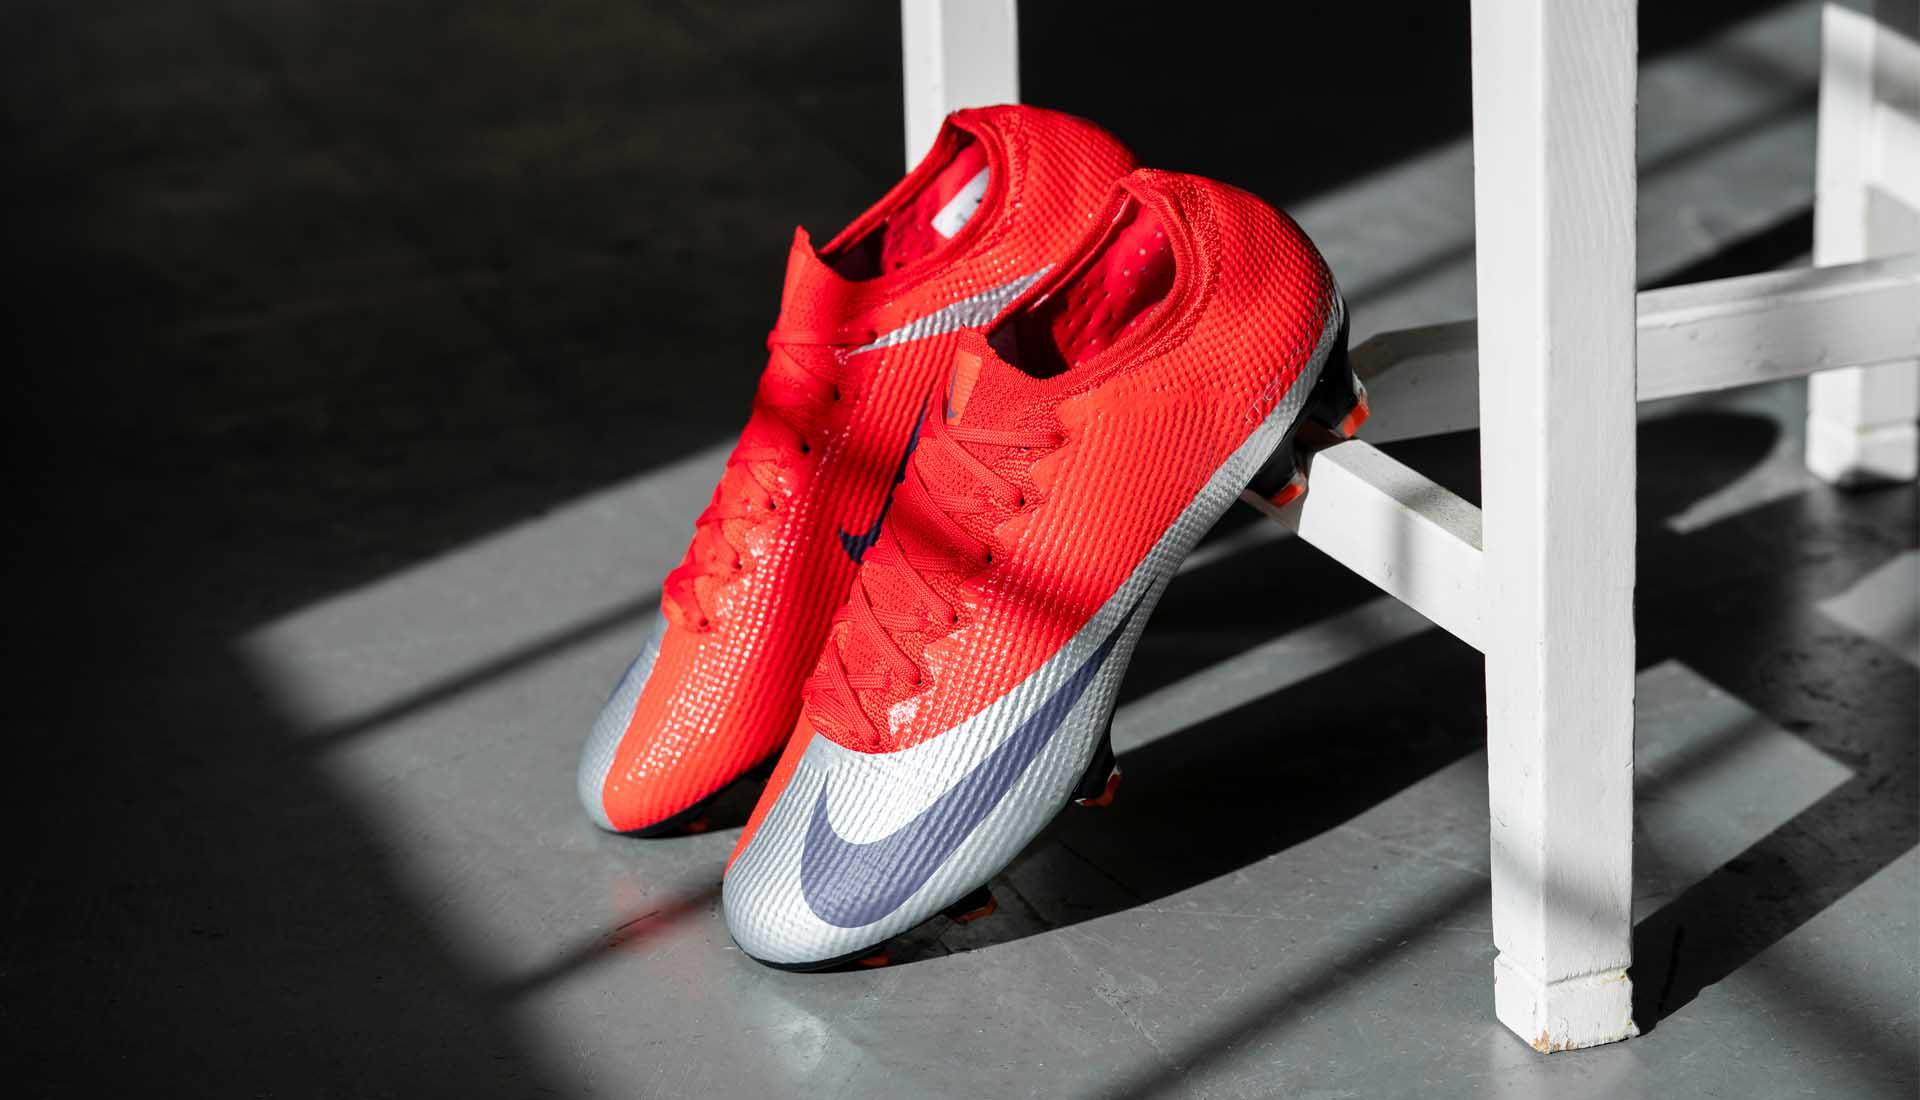 Nike Mercurial Vapor XIII - Future DNA Pack